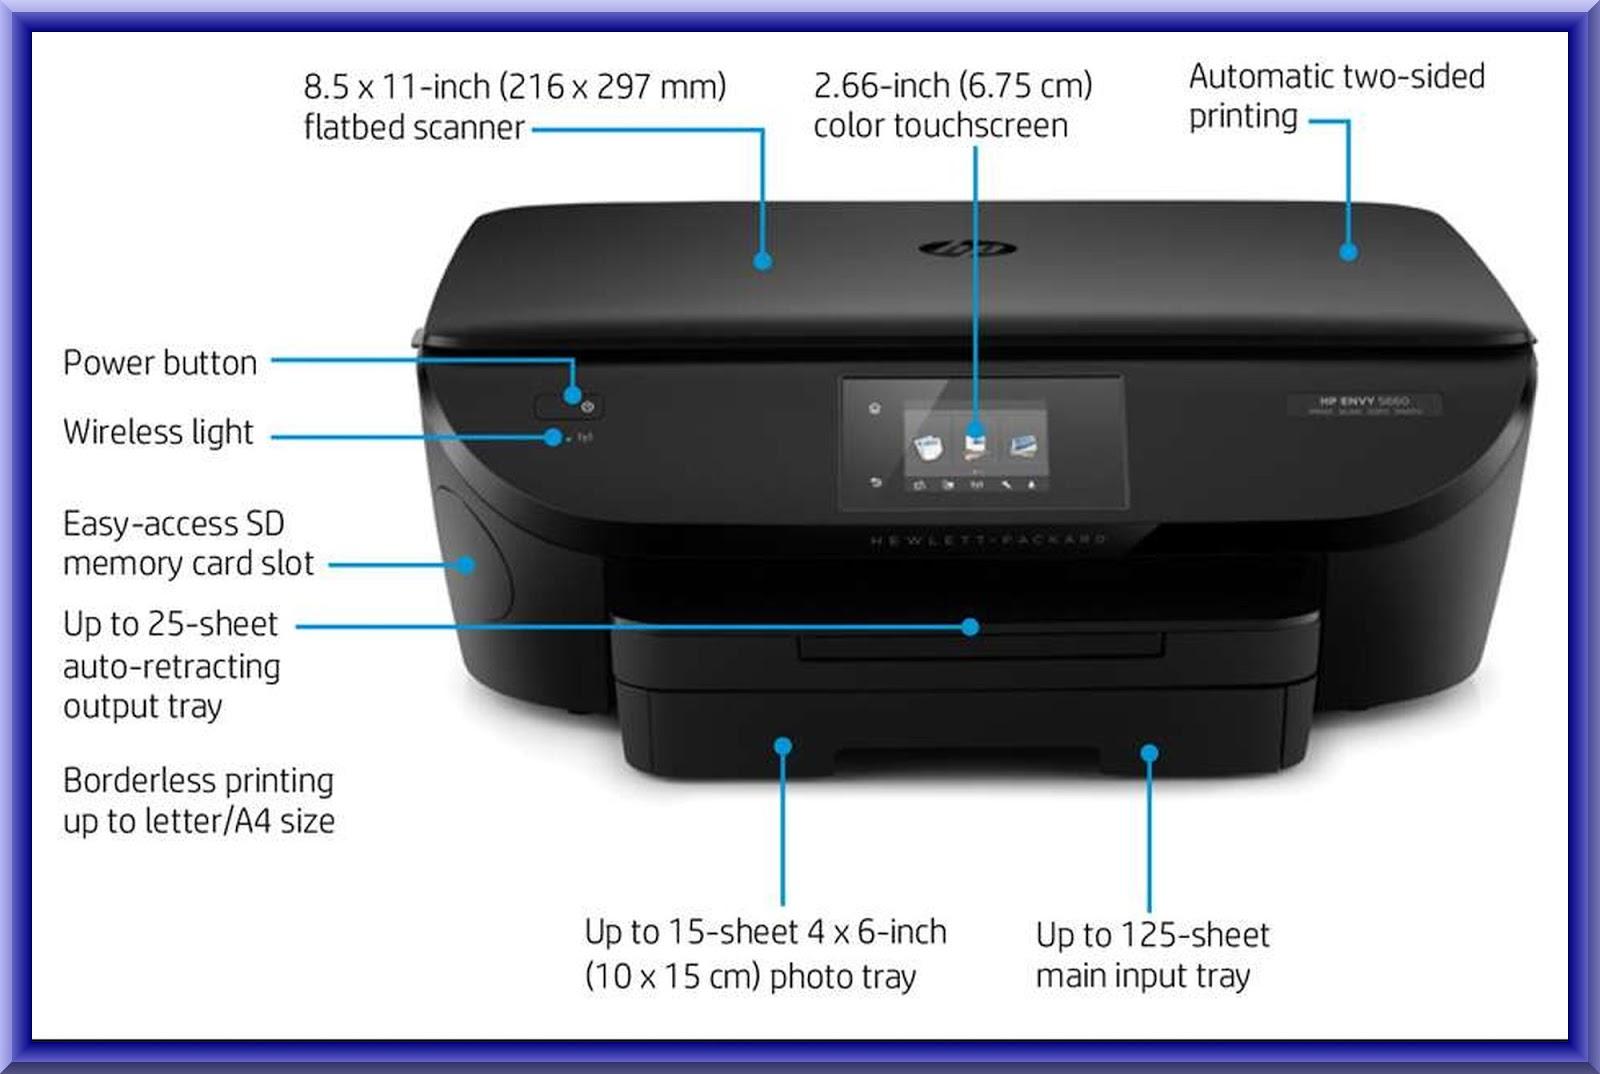 How To Setup A Printer On Iphone